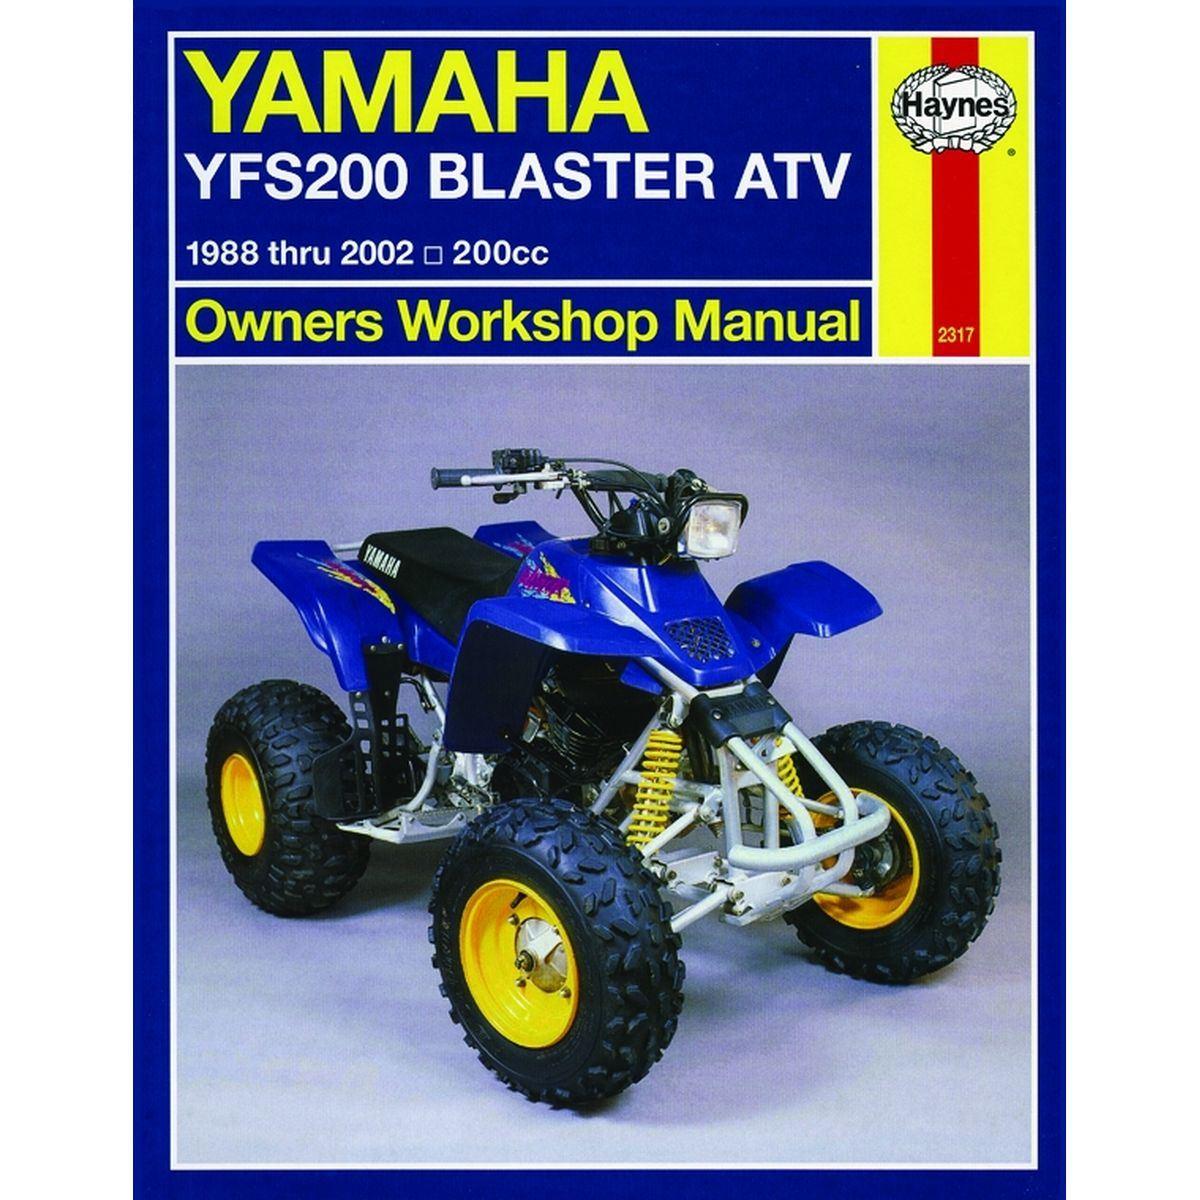 Free Yamaha blaster Manual